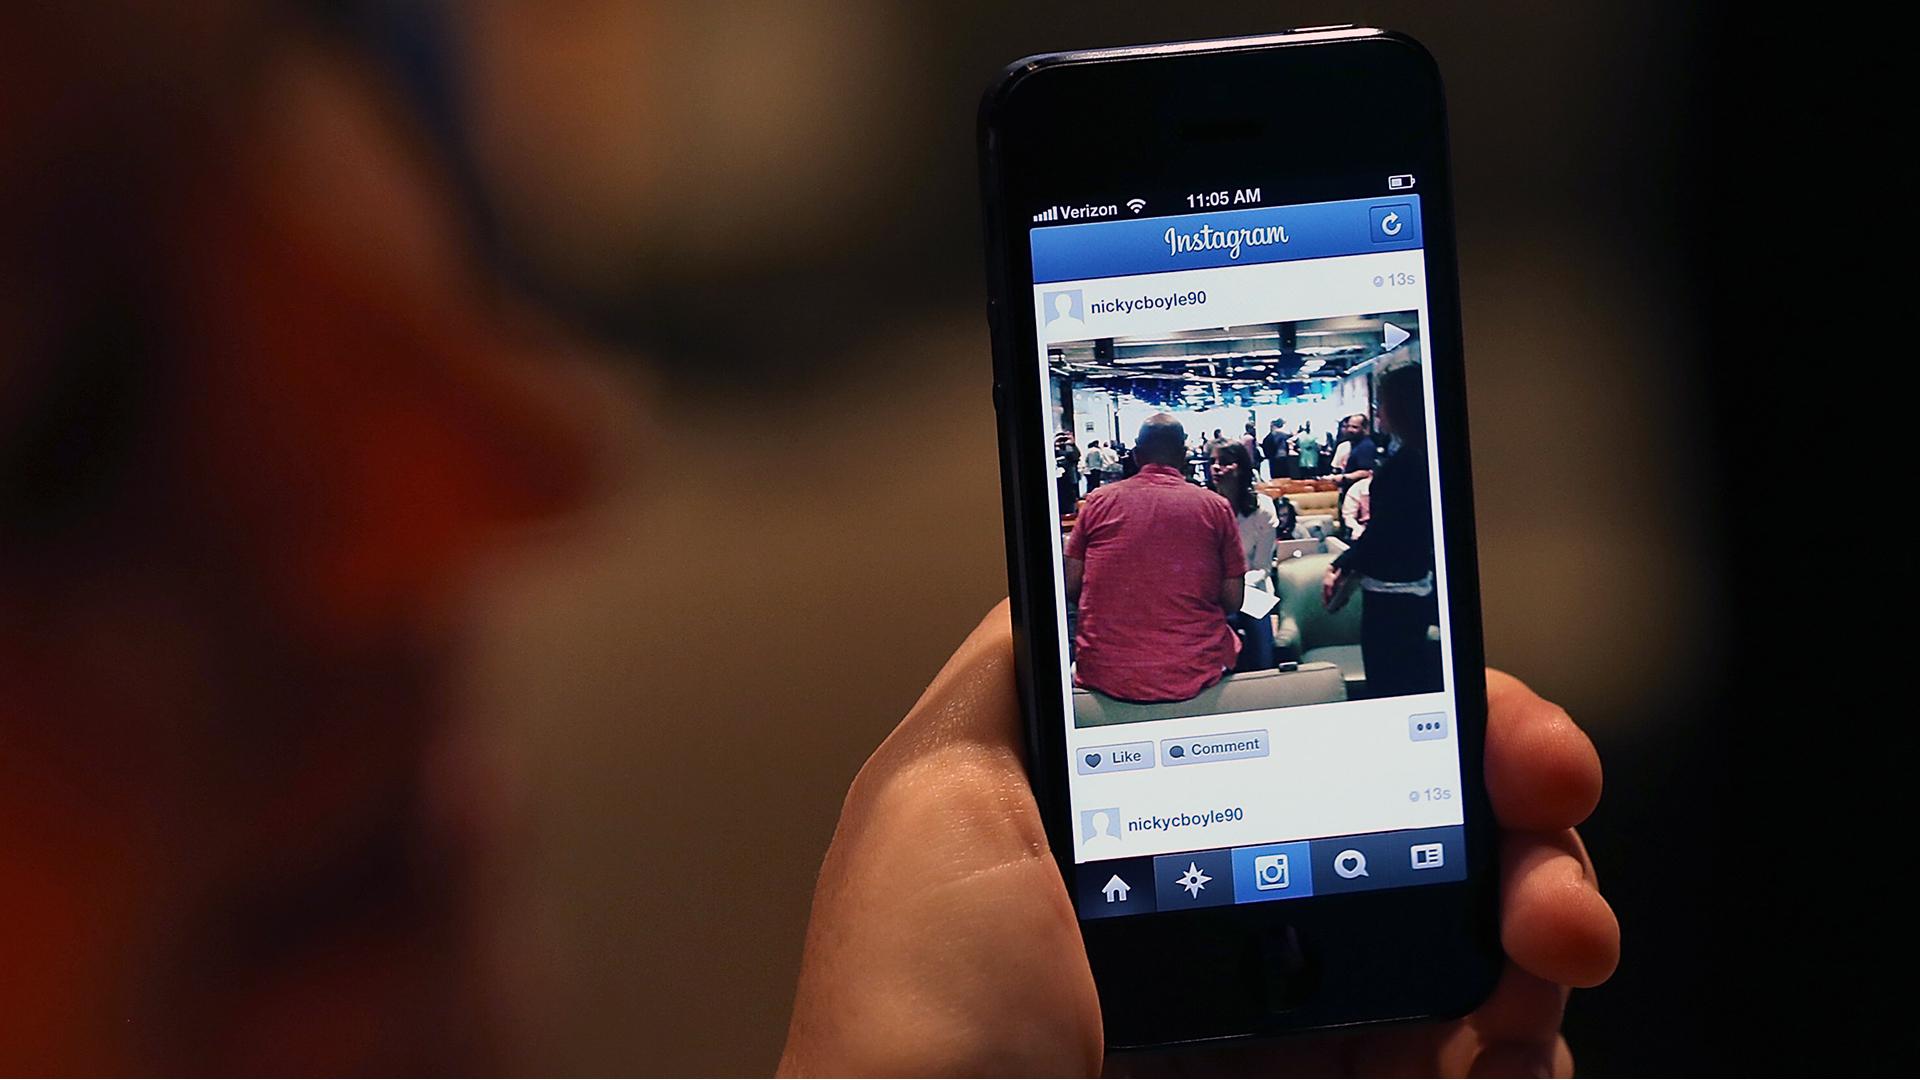 Instagram on a phone-159532.jpg31453366